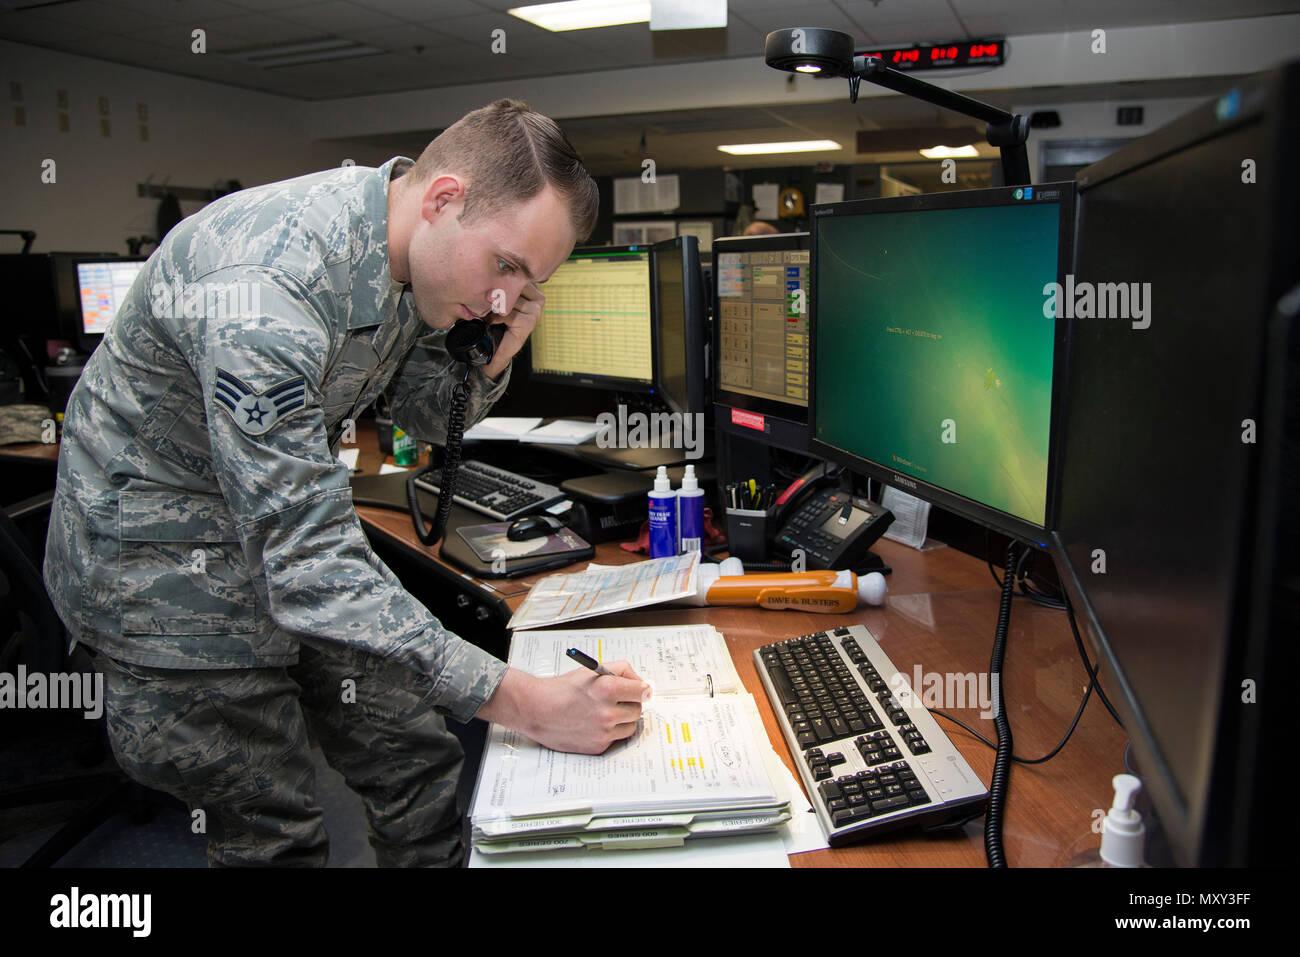 Senior Airman Thomas Ozman, 436th Airlift Wing Command Post